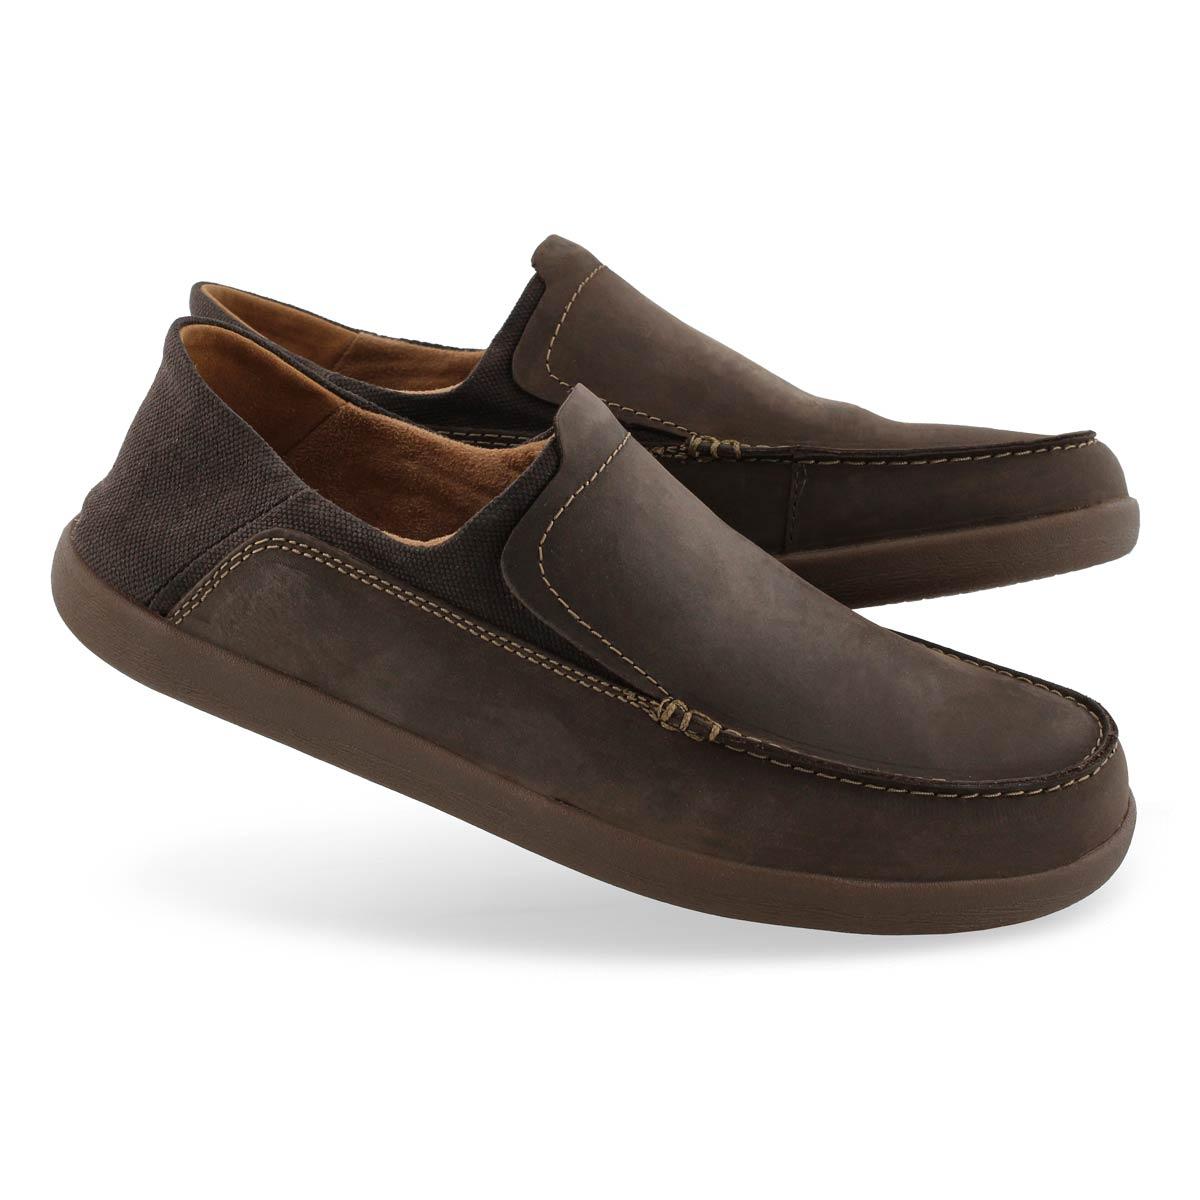 Mns Un Lisbon Lane brown casual shoe